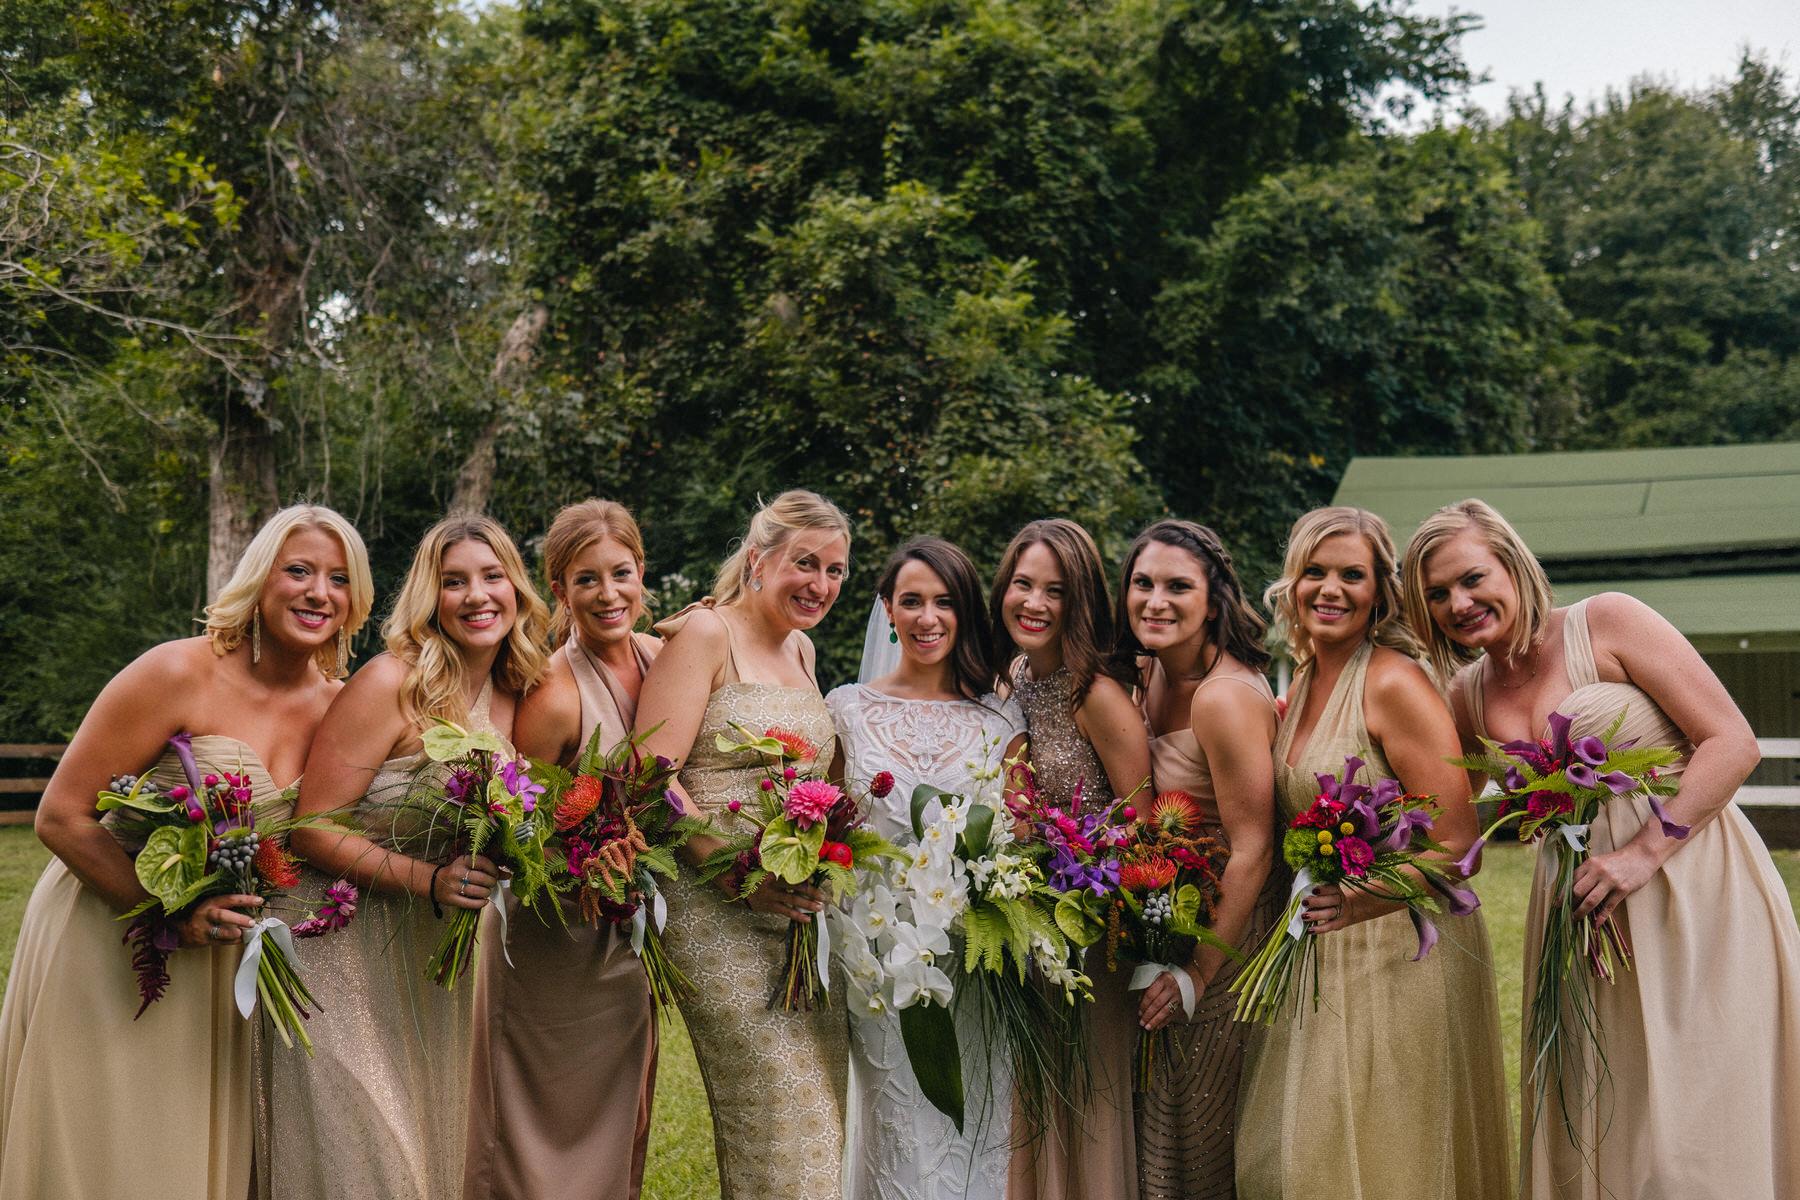 Oxford_mississippi_wedding_photographer_039.jpg